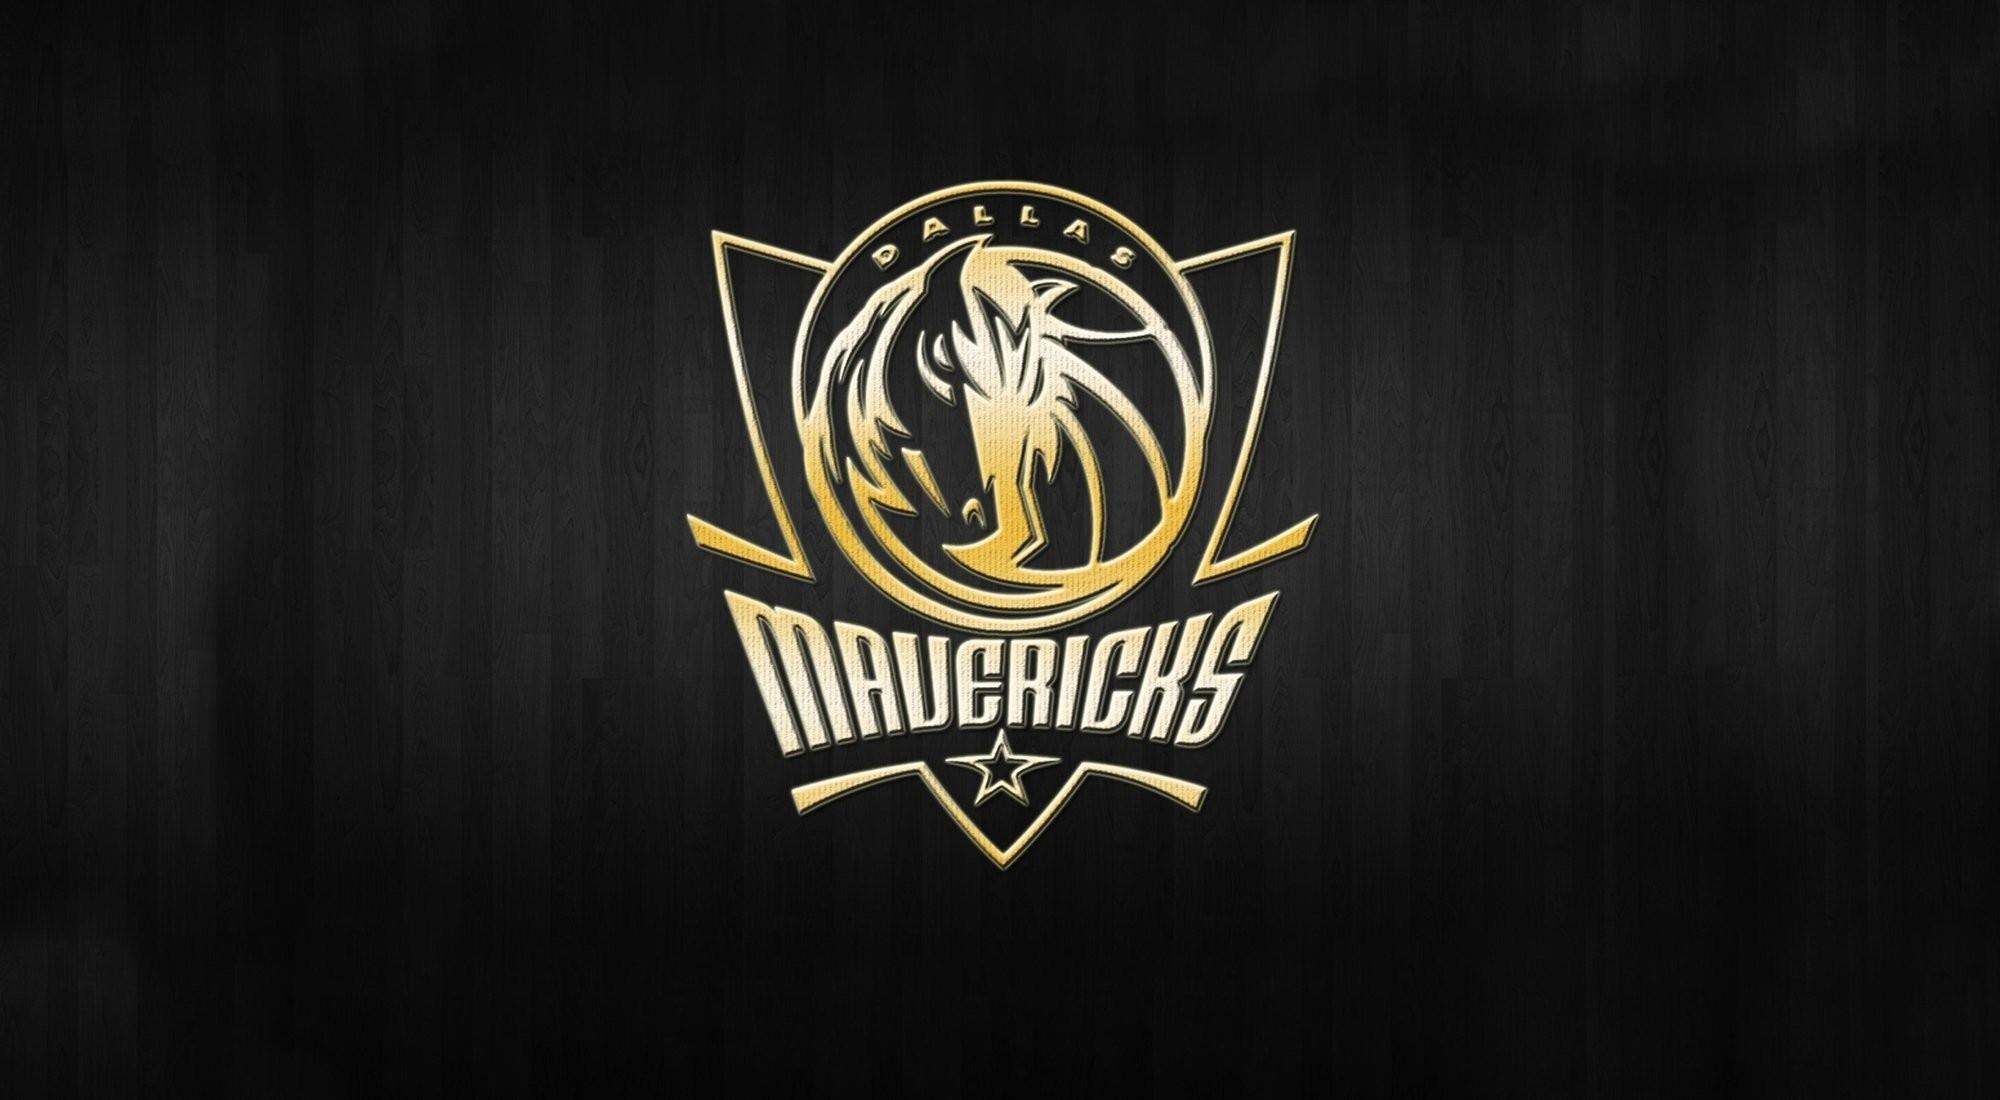 dallas mavericks basketball nba logo background gold